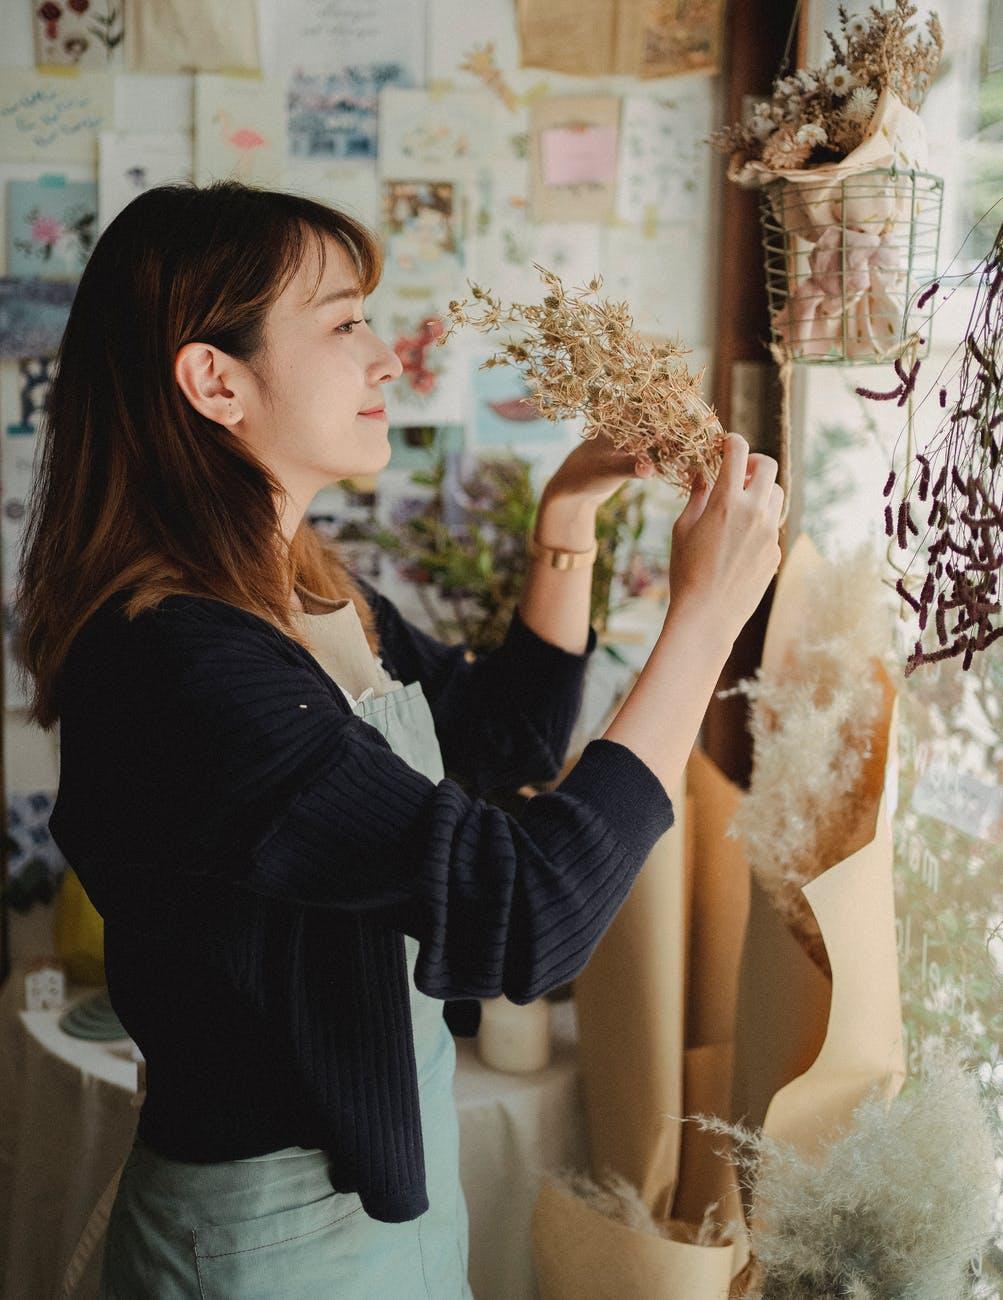 calm asian female choosing herbarium in store